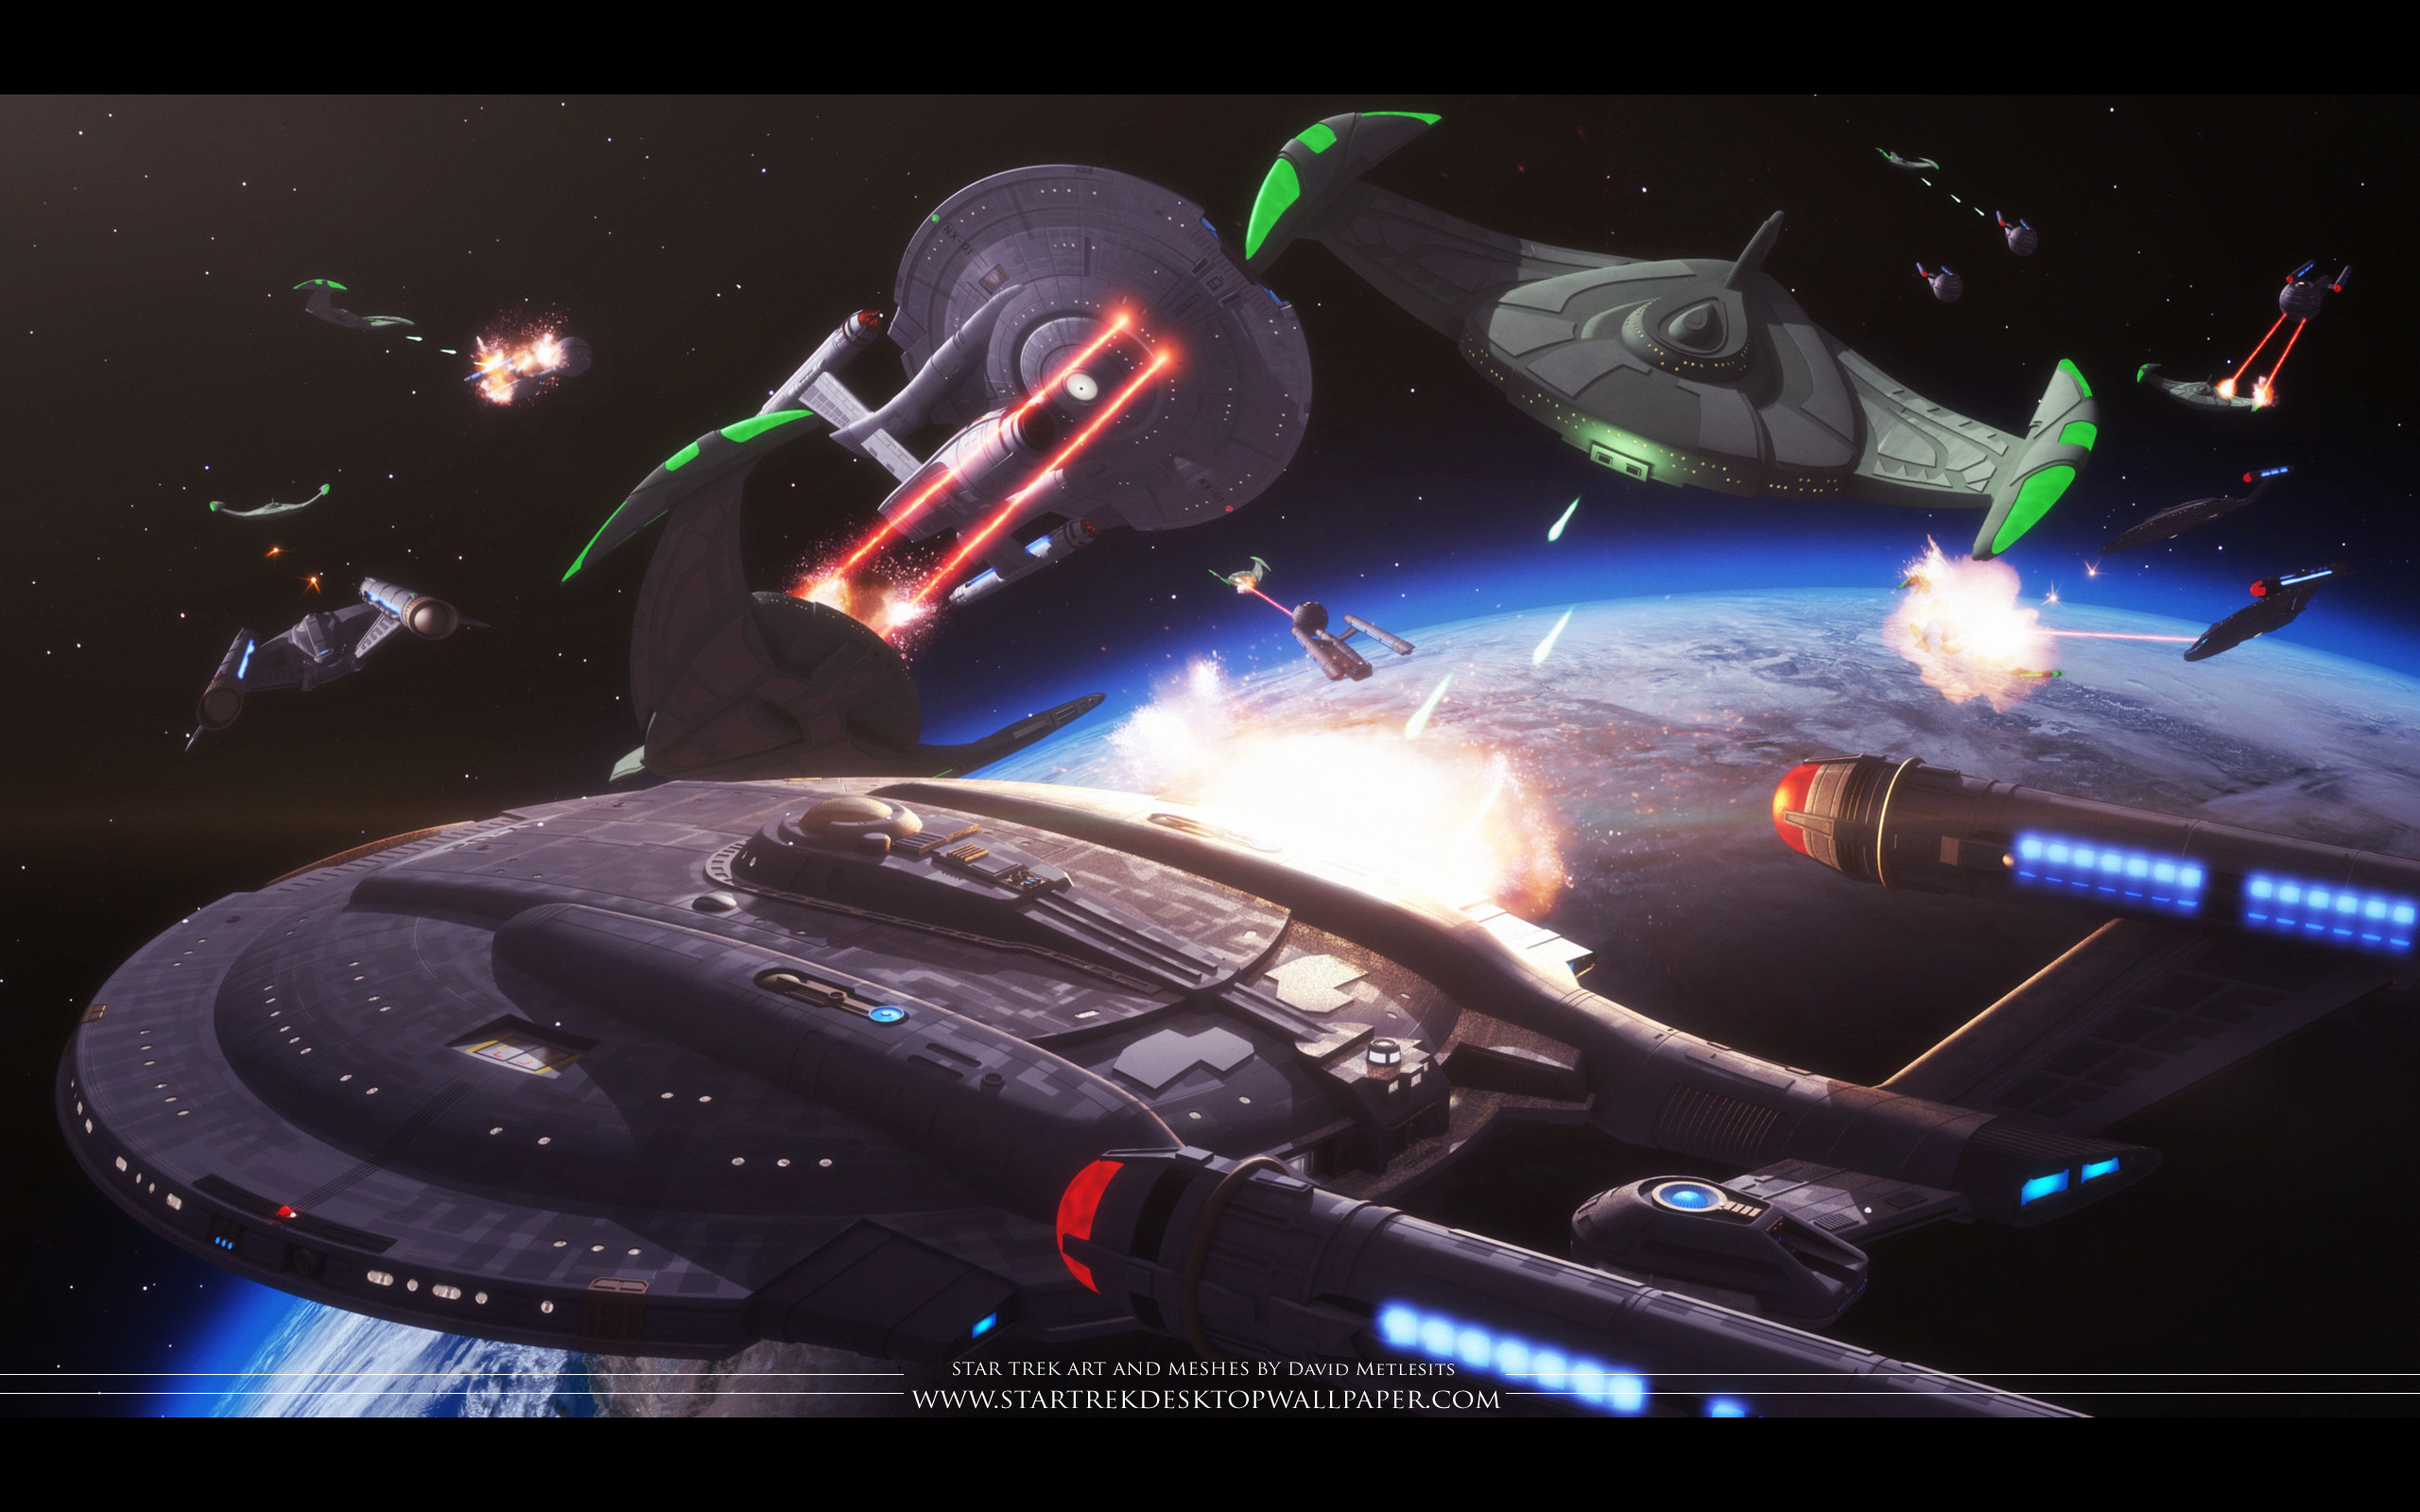 Star Trek Space Battle – free Star Trek computer desktop wallpaper,  pictures, images